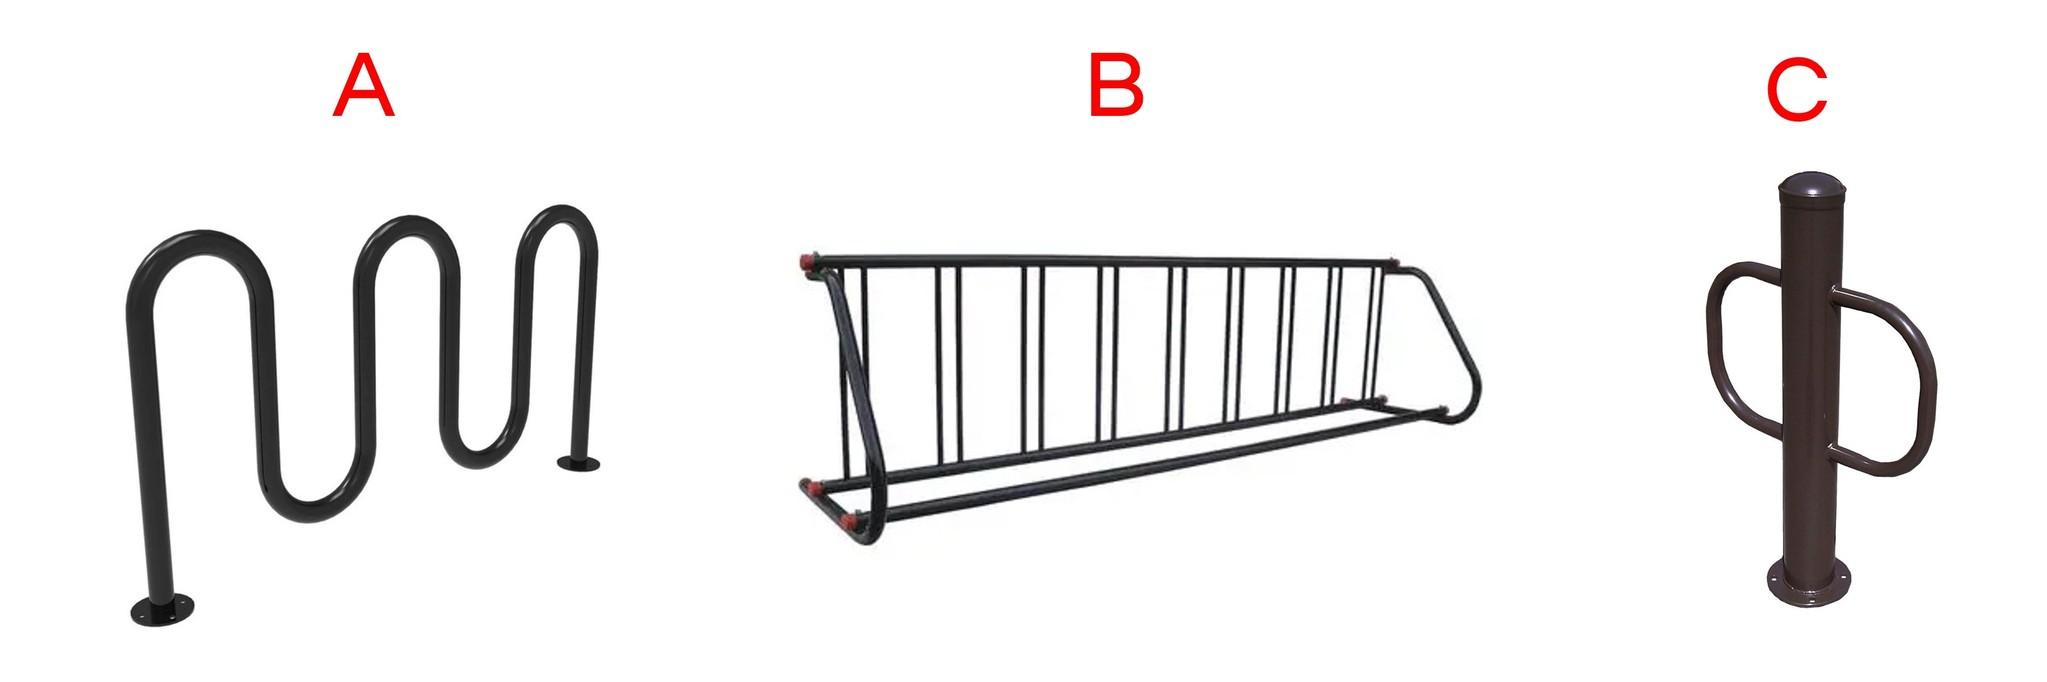 Bike Rack Types